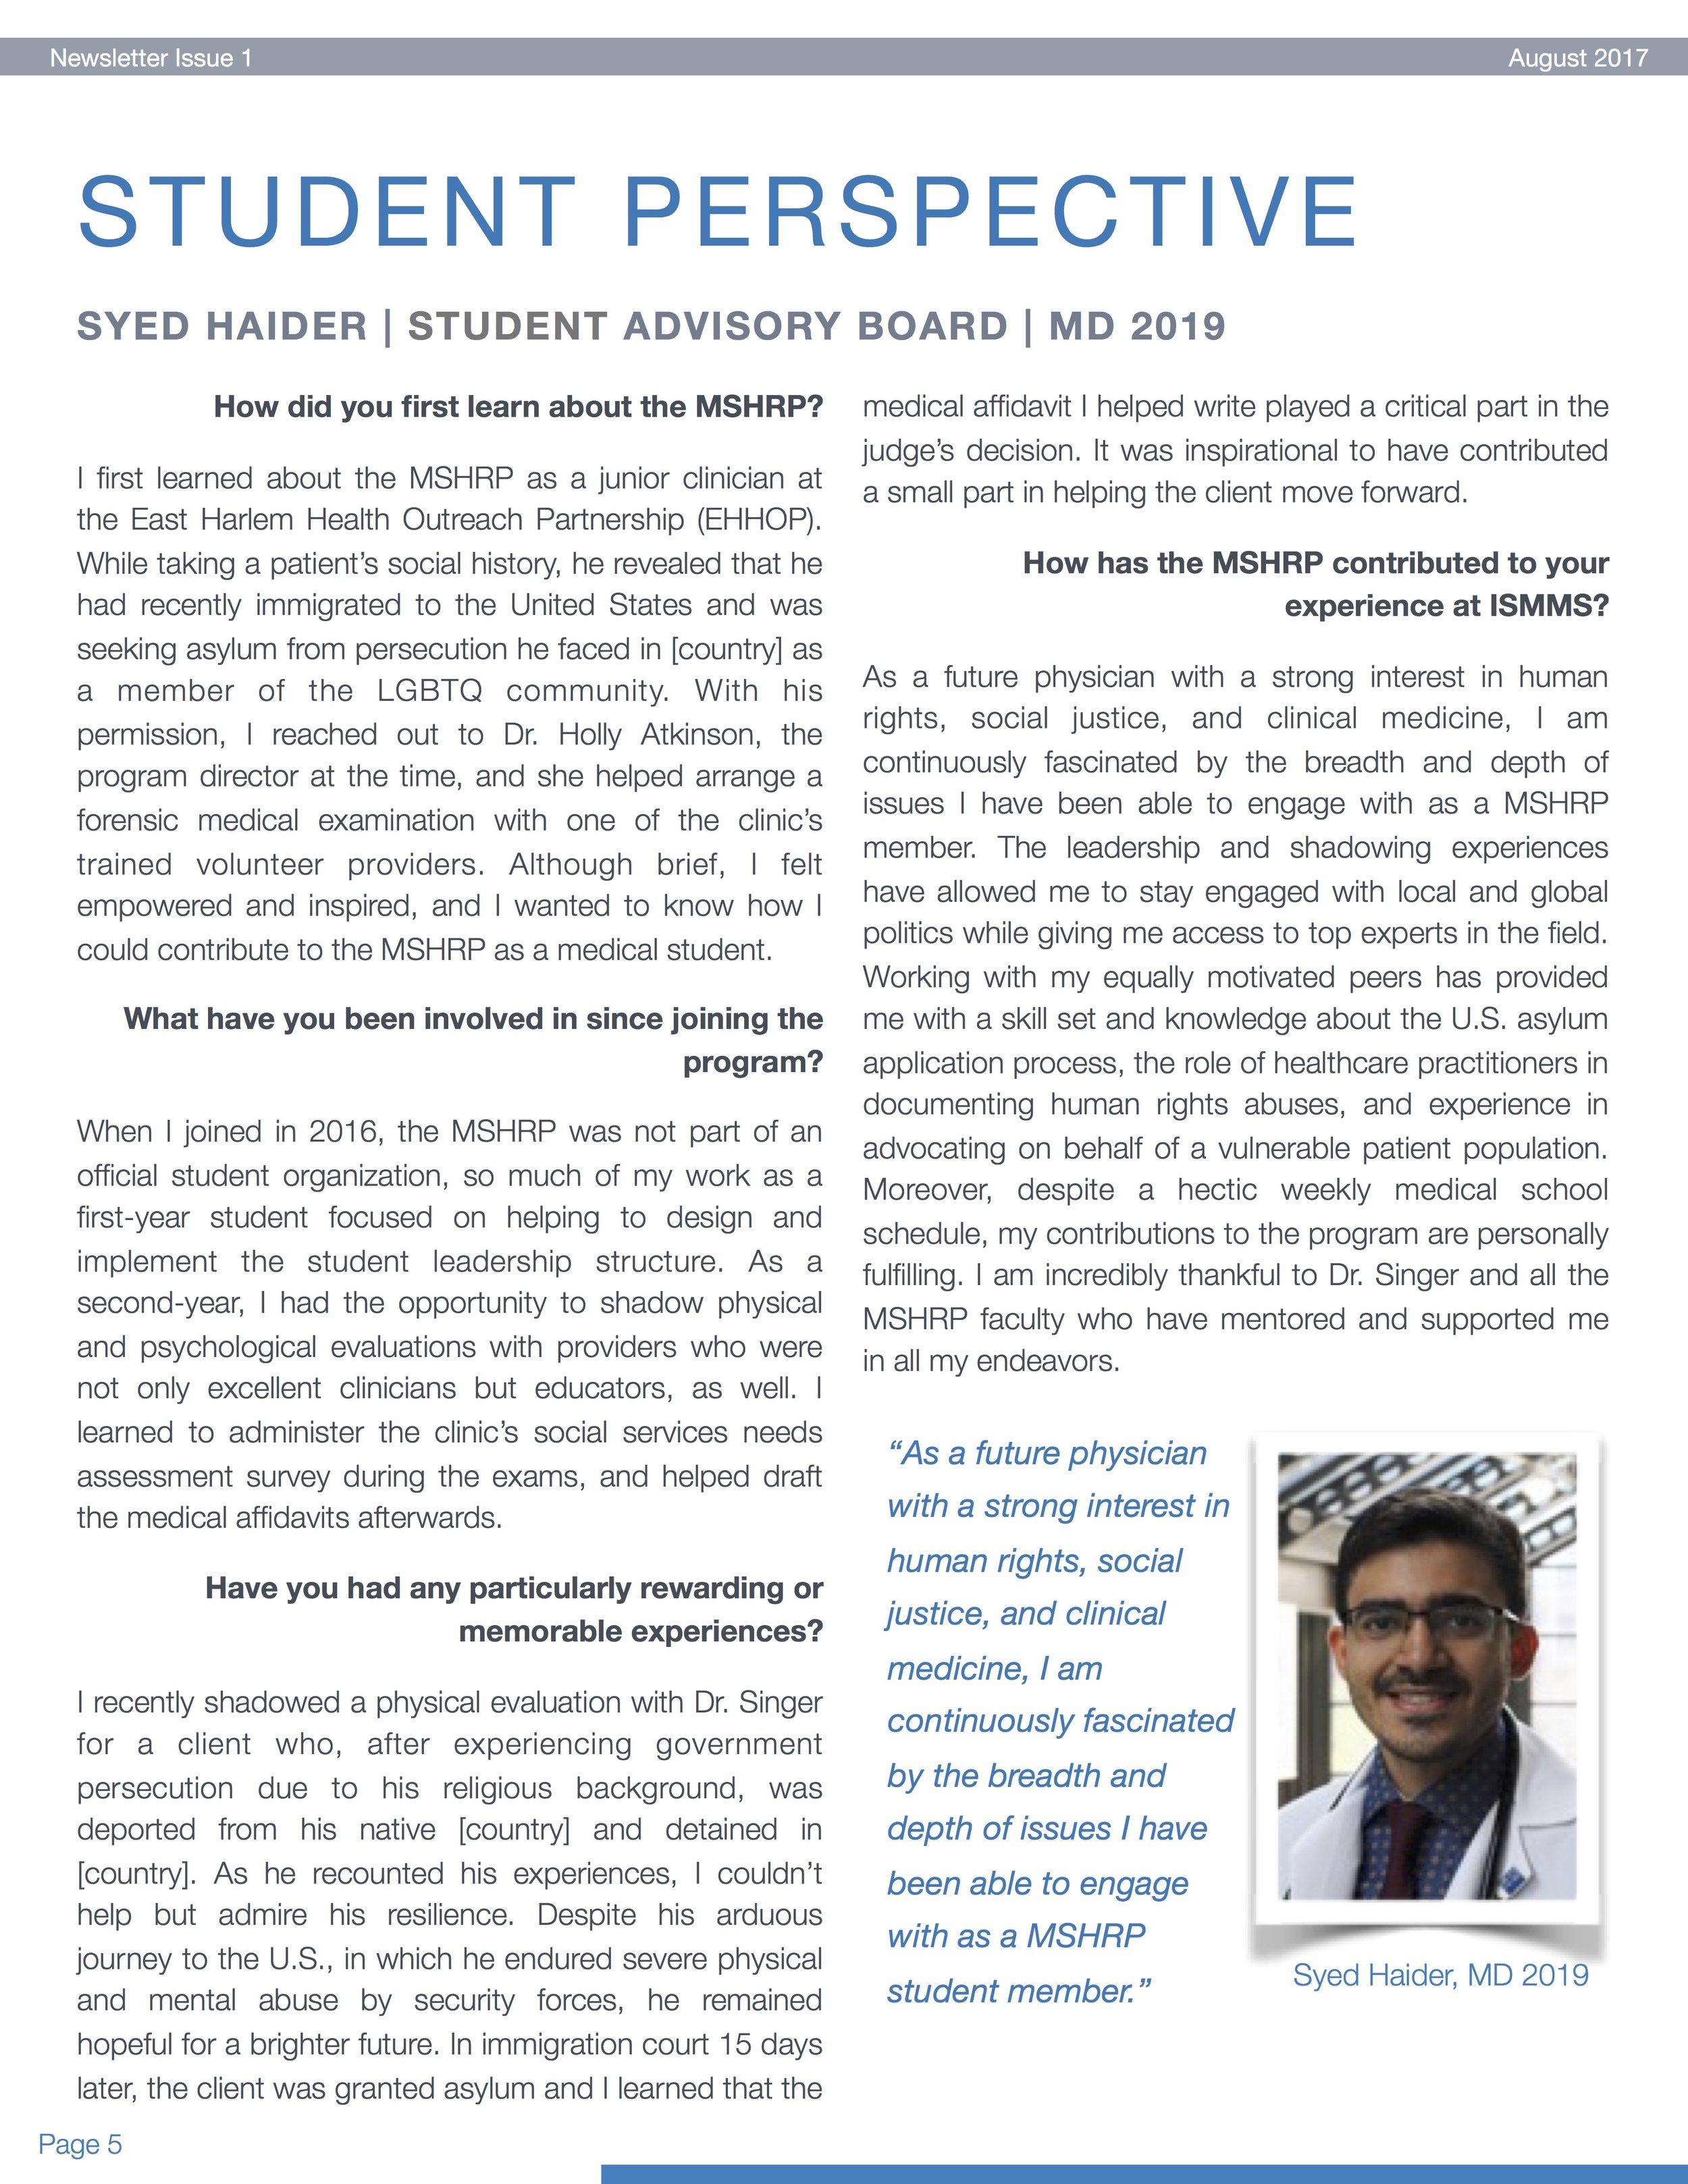 MSHRP Newsletter Aug 28 2017_FINAL (dragged) 4.jpg